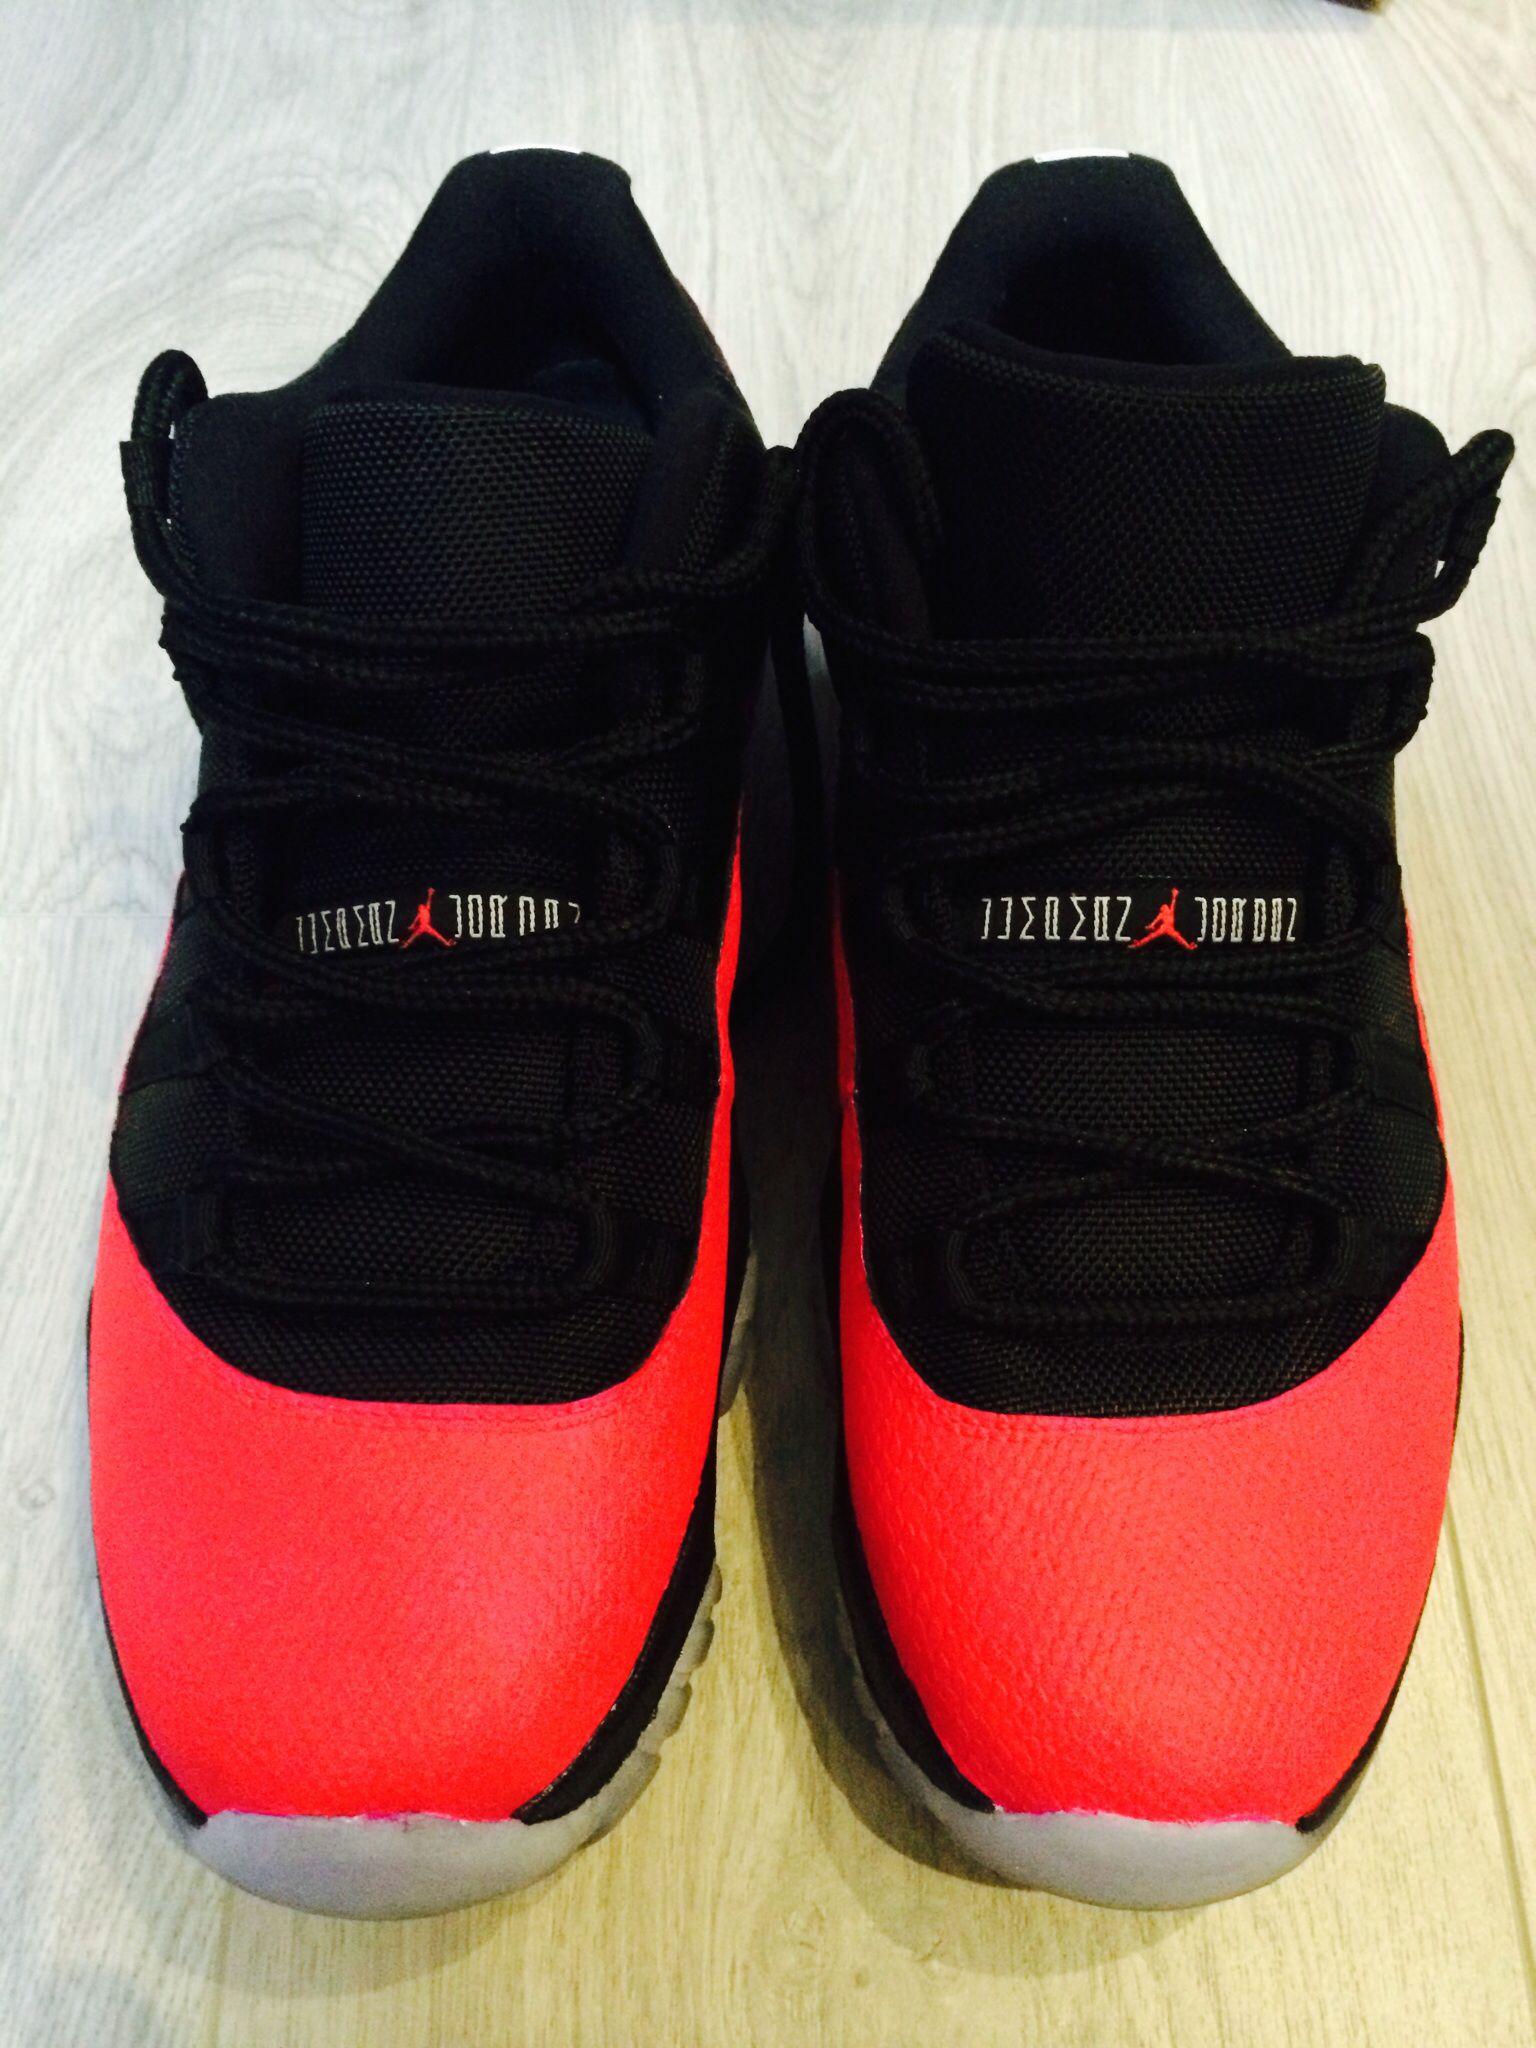 be9491ba9e43 ferrari shoes jordan on sale   OFF38% Discounts